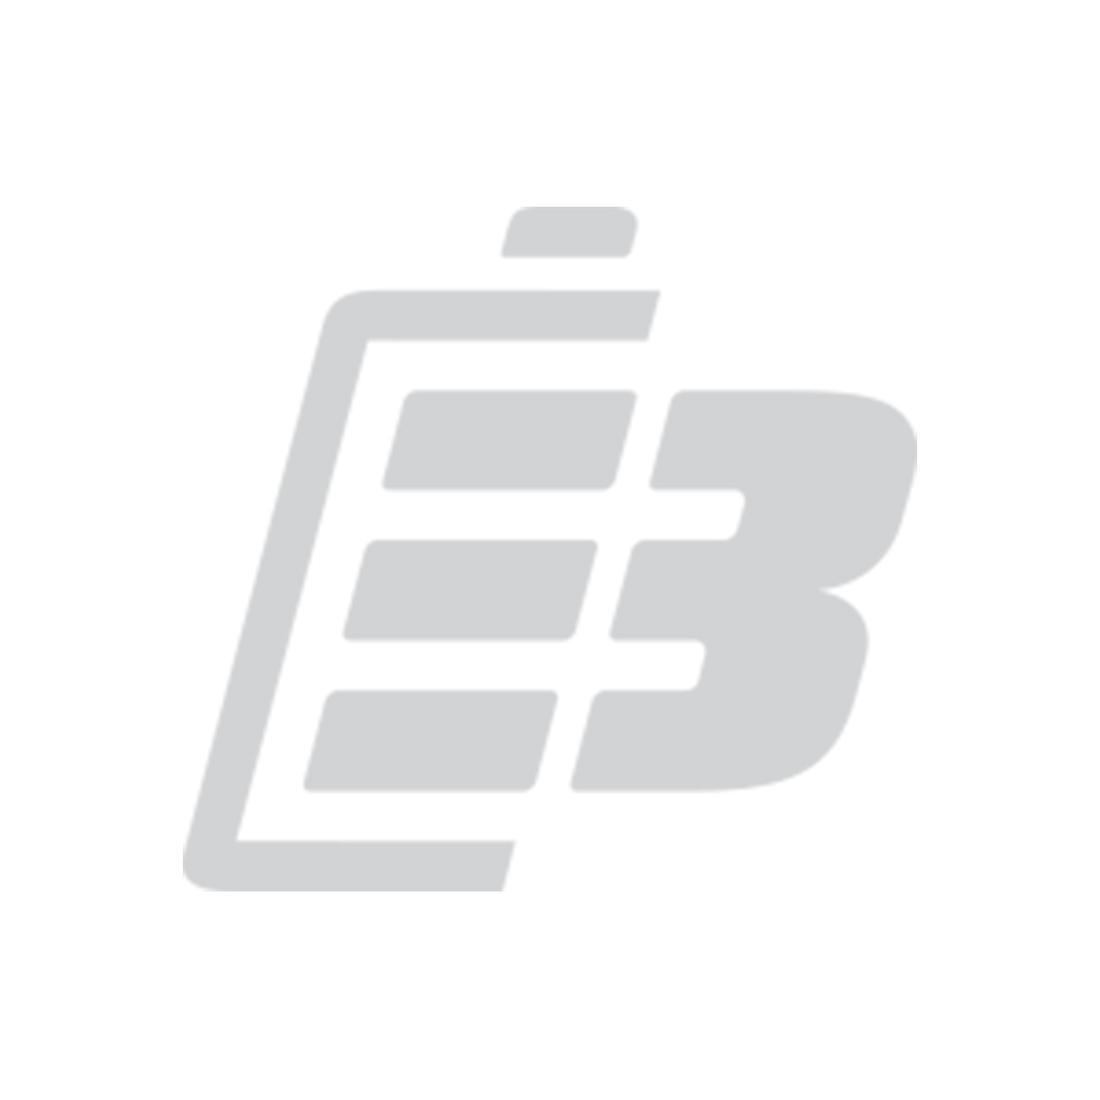 LG 18650 HG2 battery 3000mah 20A 1